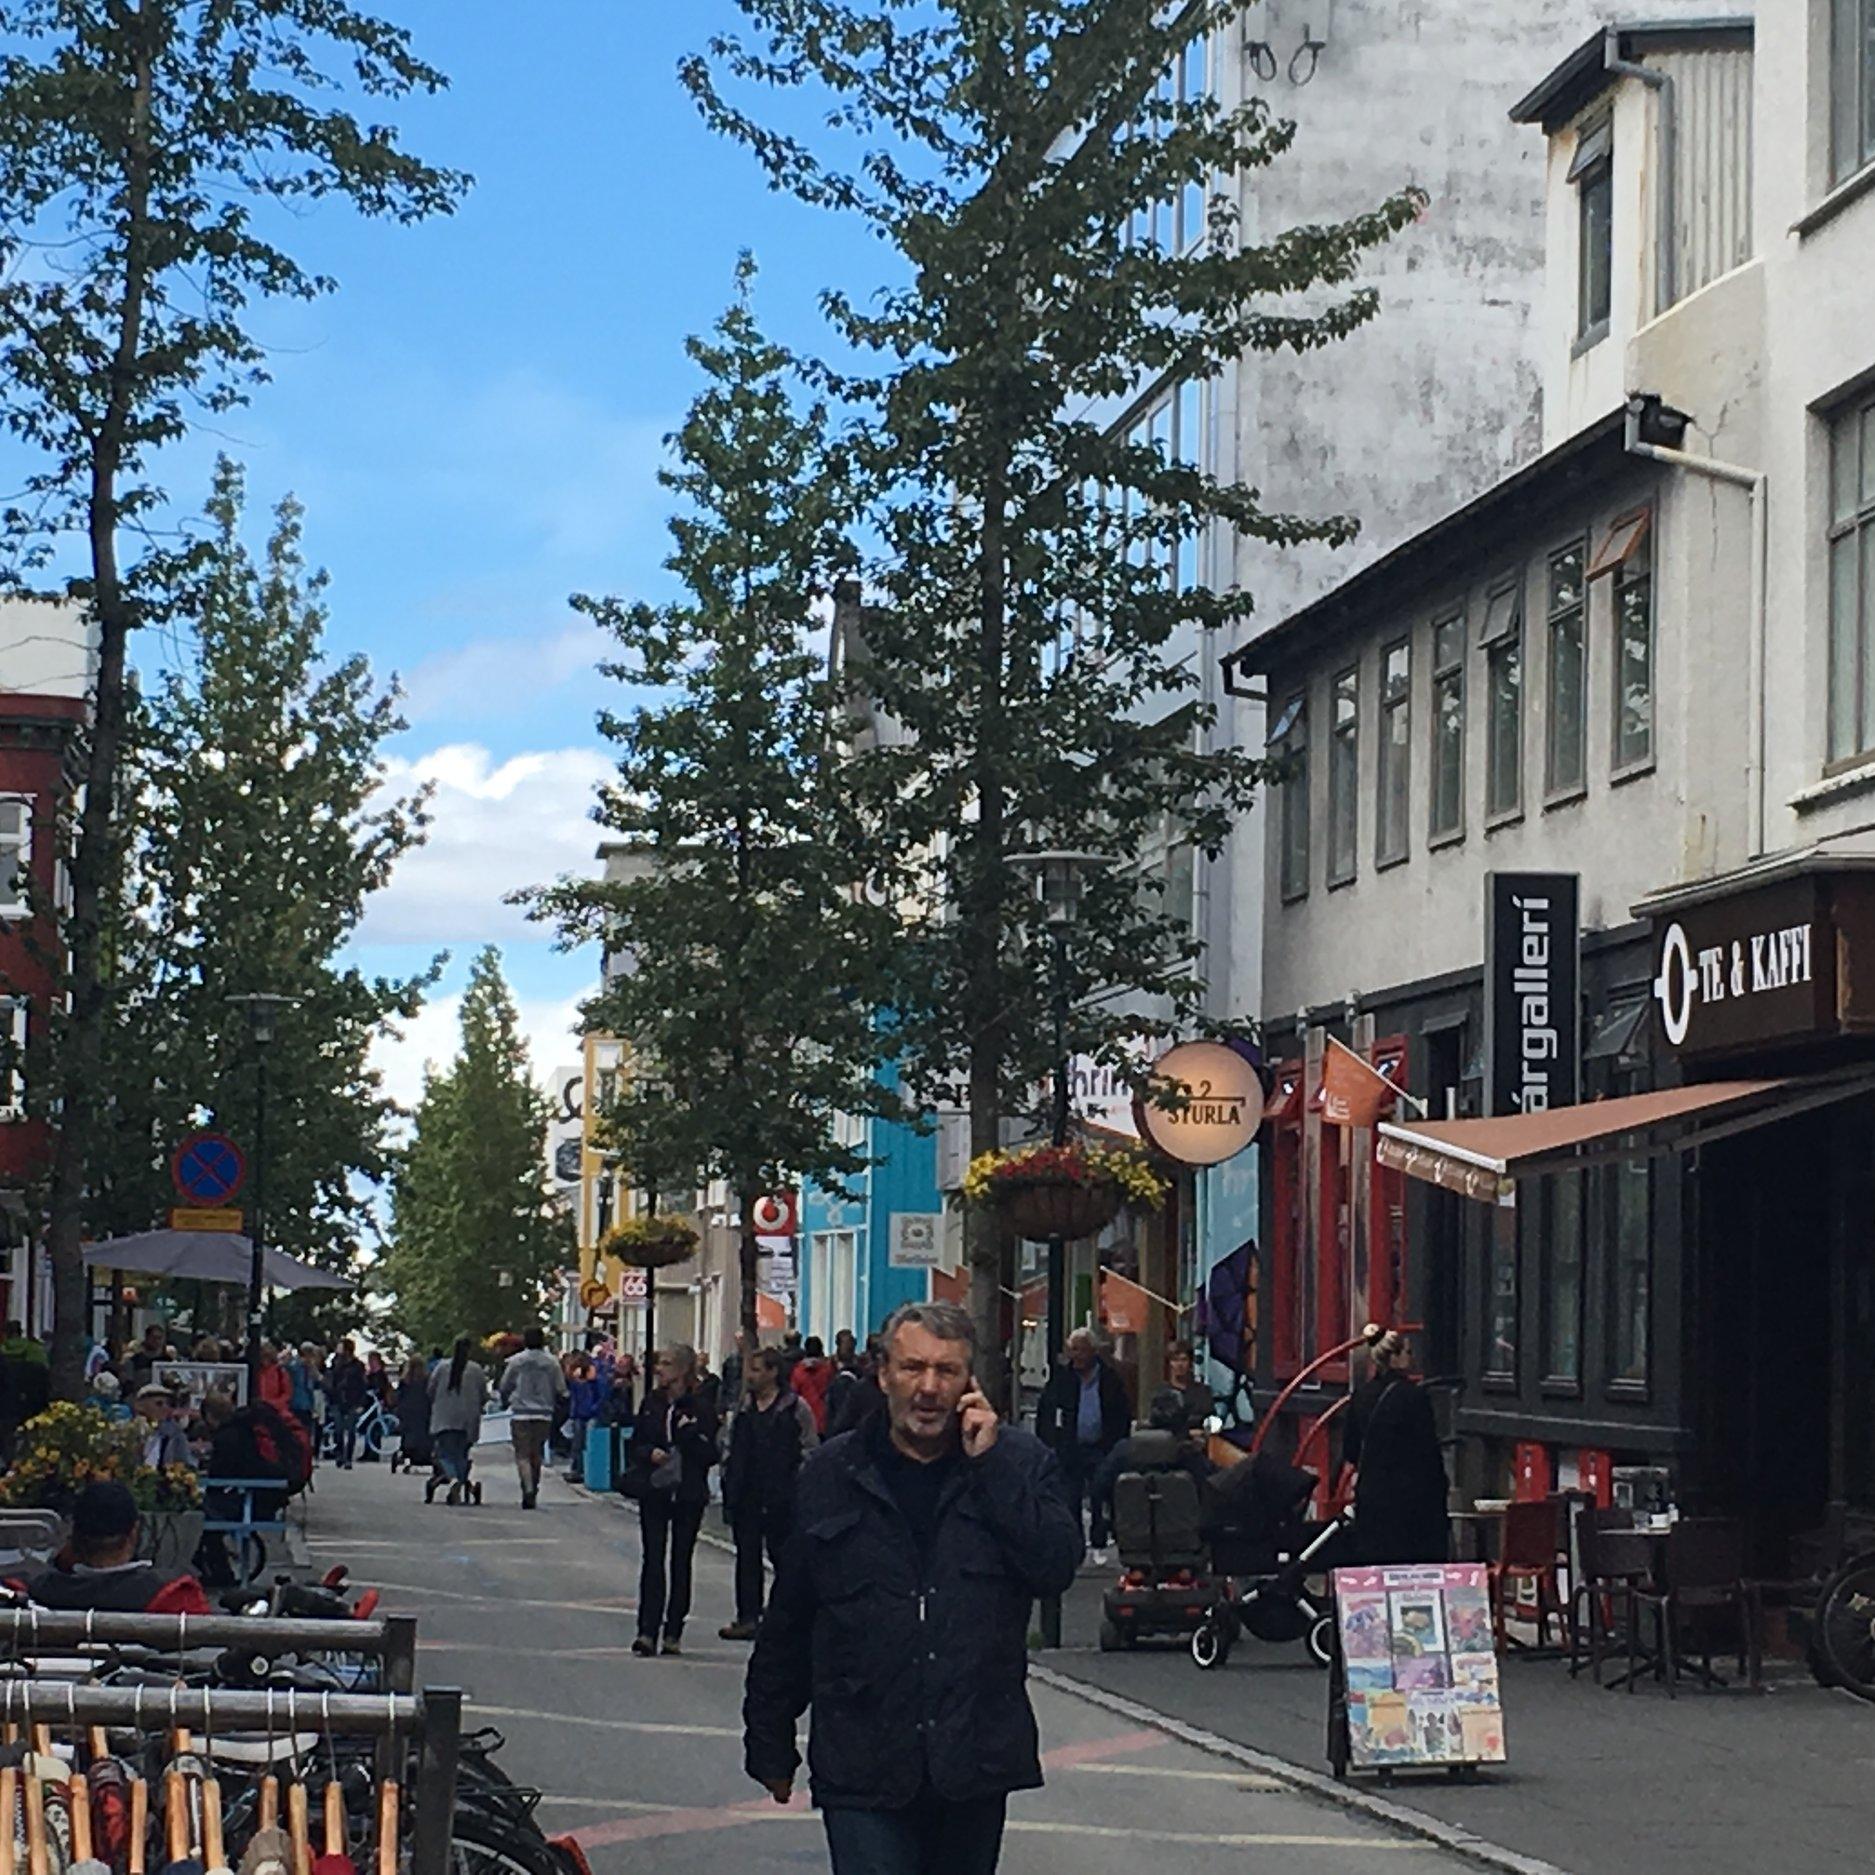 Reykjavik by The Doubtful Traveller